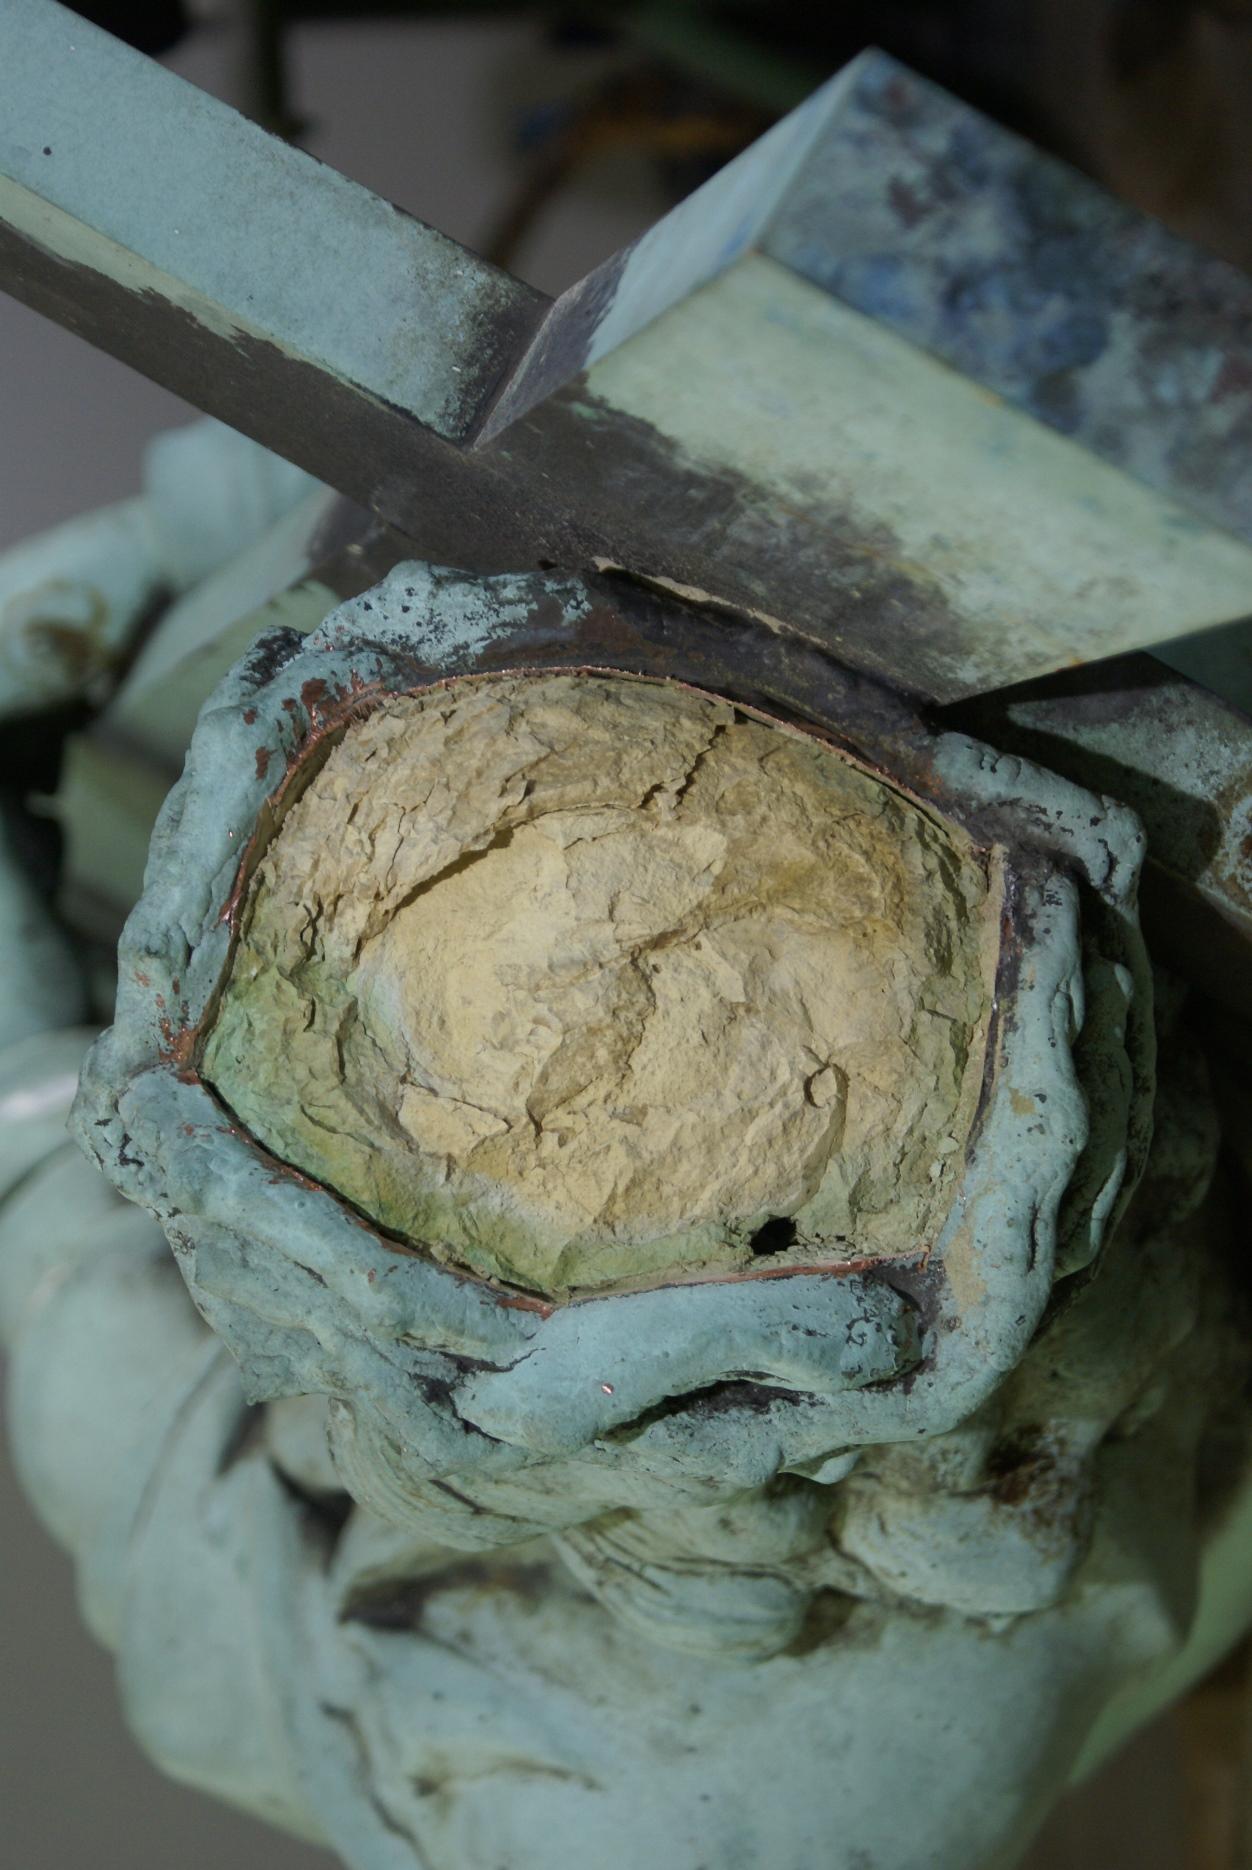 Detailansicht Kopf nach Abnahme der Kupferhaut: Innerer Gipskern